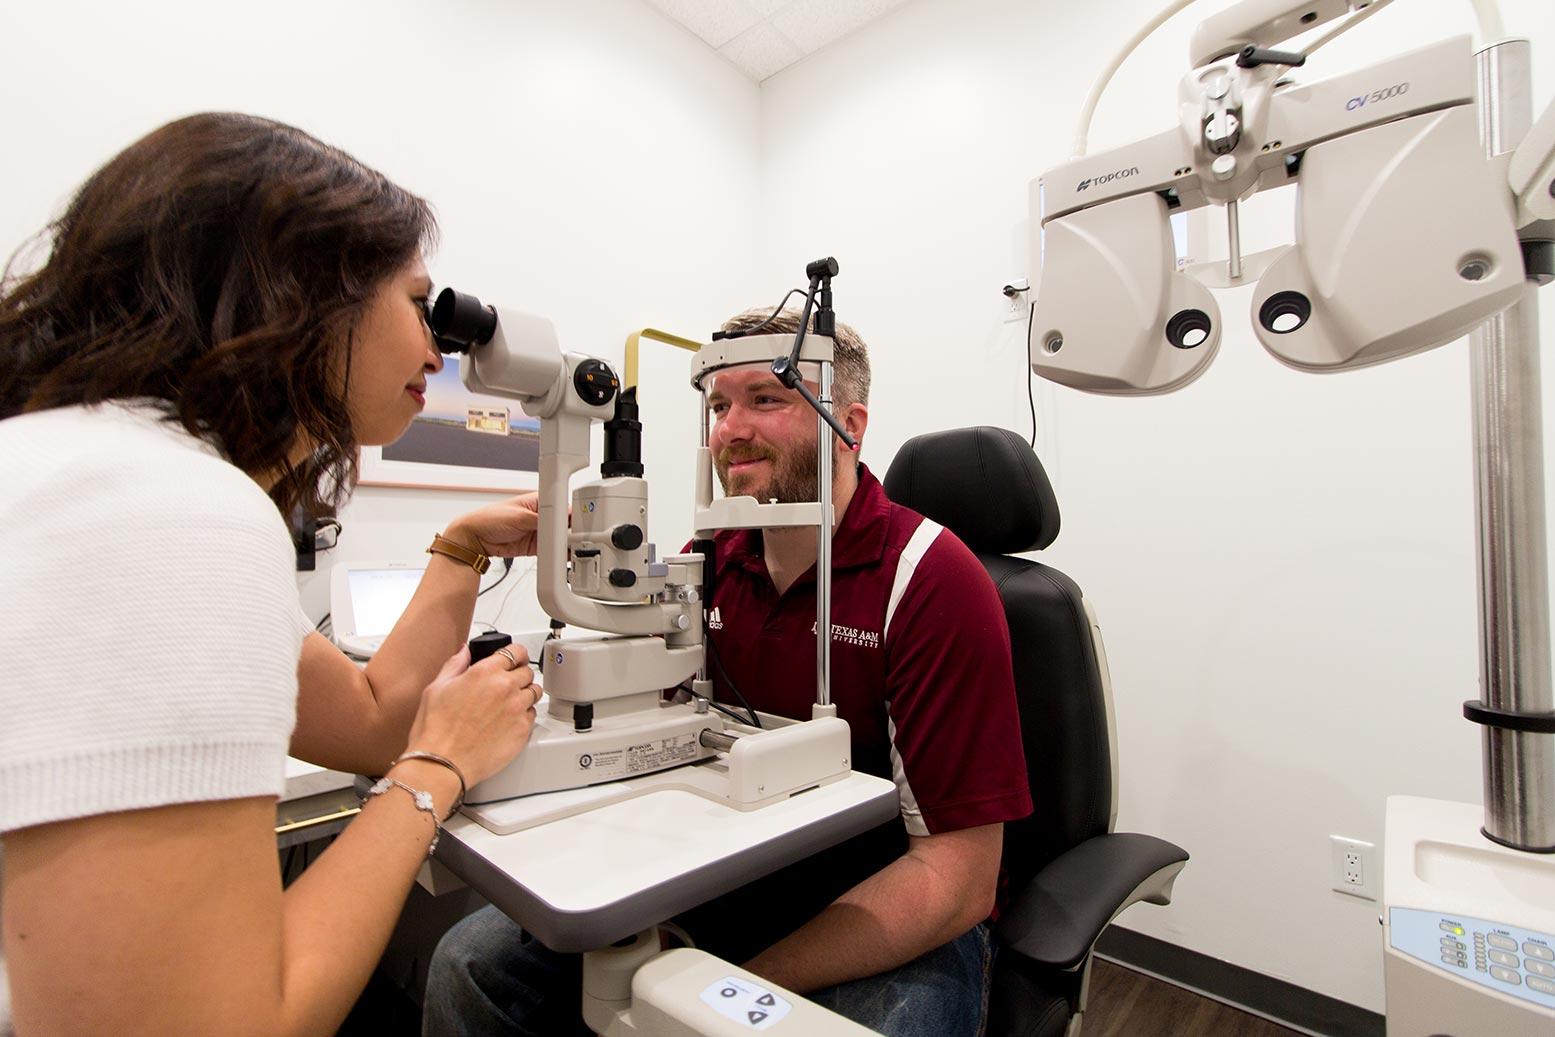 Man getting eye exam at Monocle Premier Eye Care   West University Place Optometry, Houston